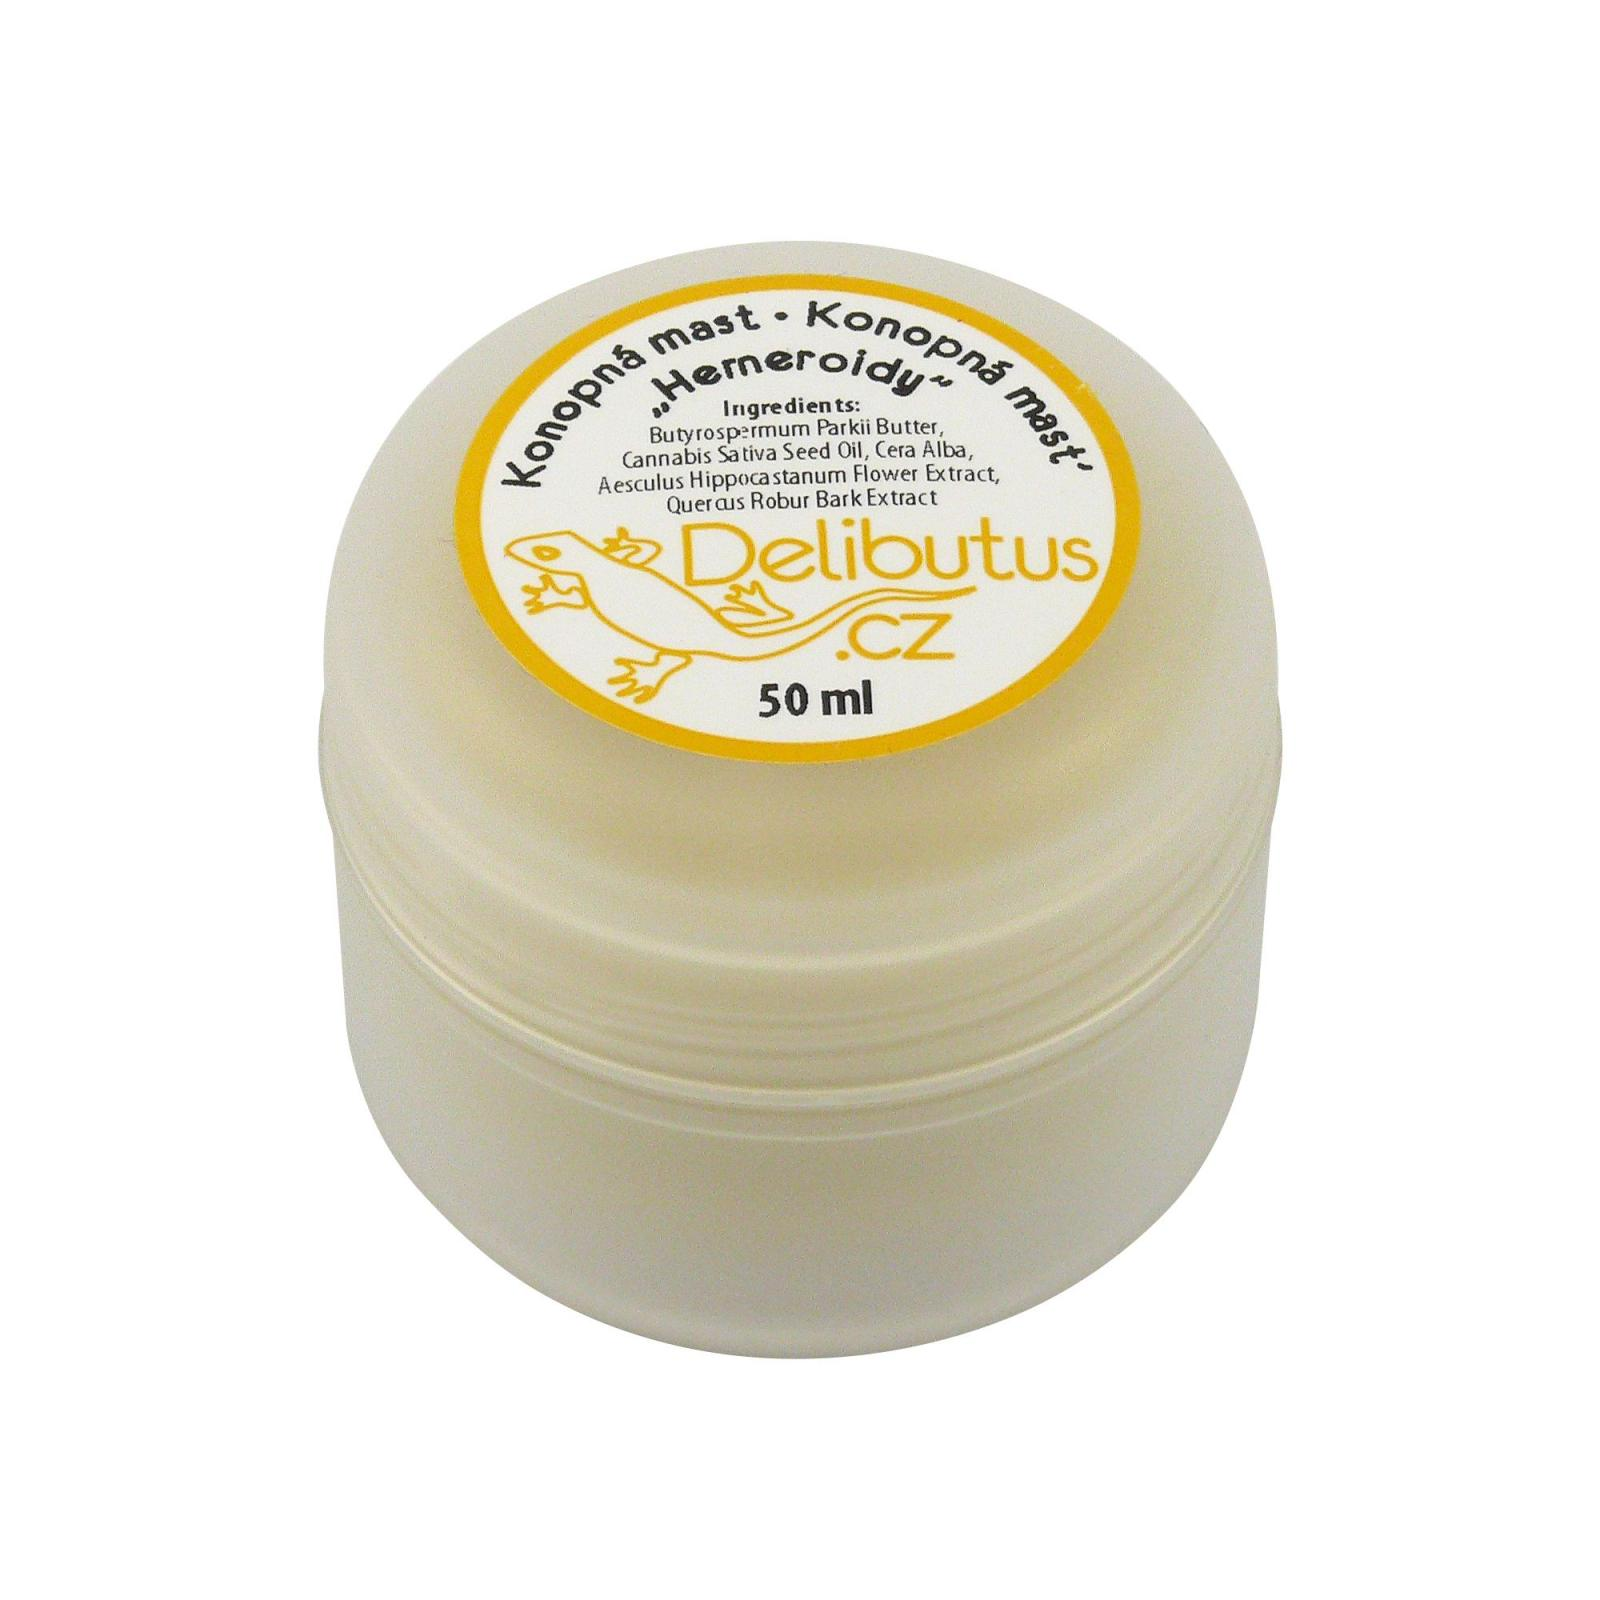 Delibutus Konopná mast Hemeroidy 50 ml